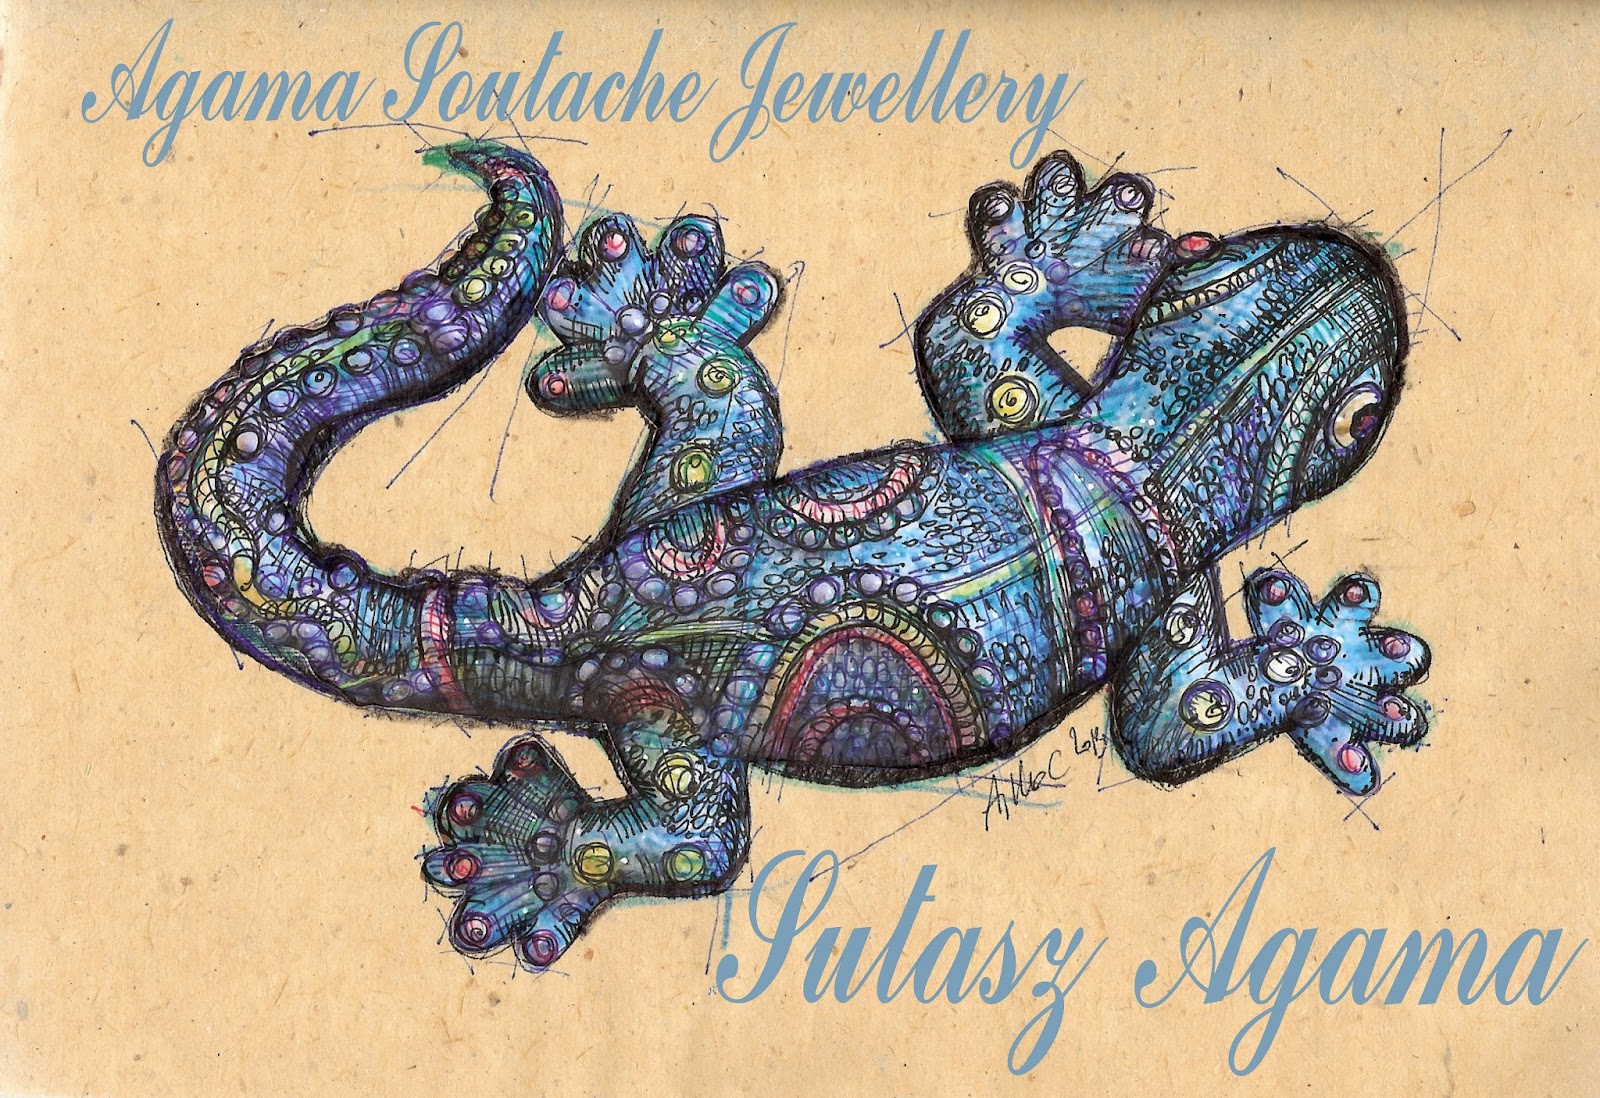 #Sutasz Agama - Soutache Agama Jewellery